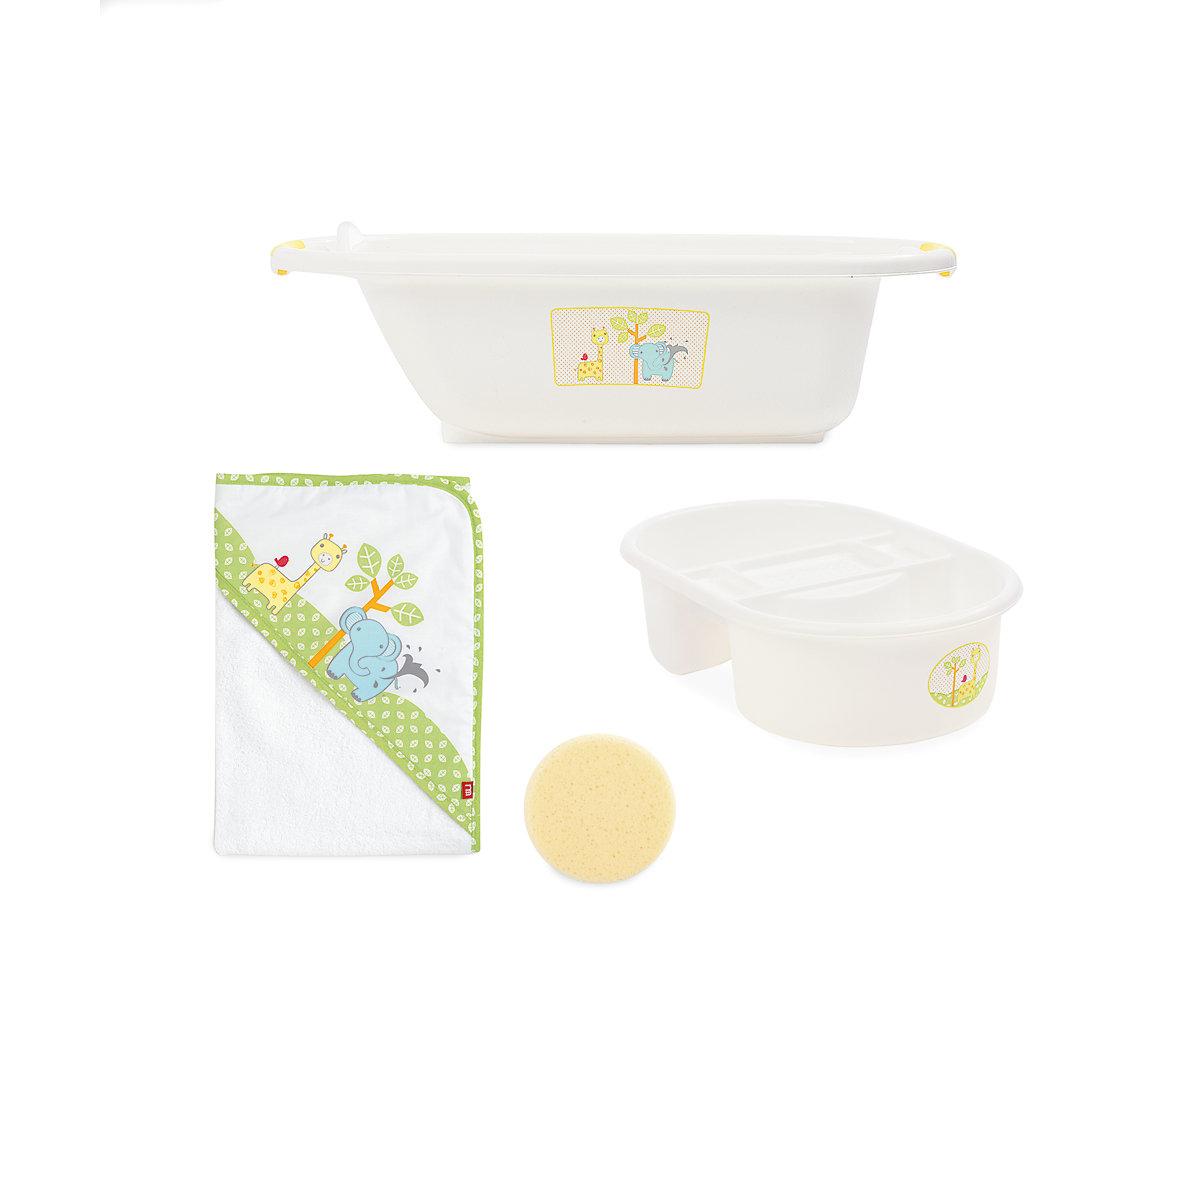 mothercare baby 39 s snoozie safari bath set ebay. Black Bedroom Furniture Sets. Home Design Ideas